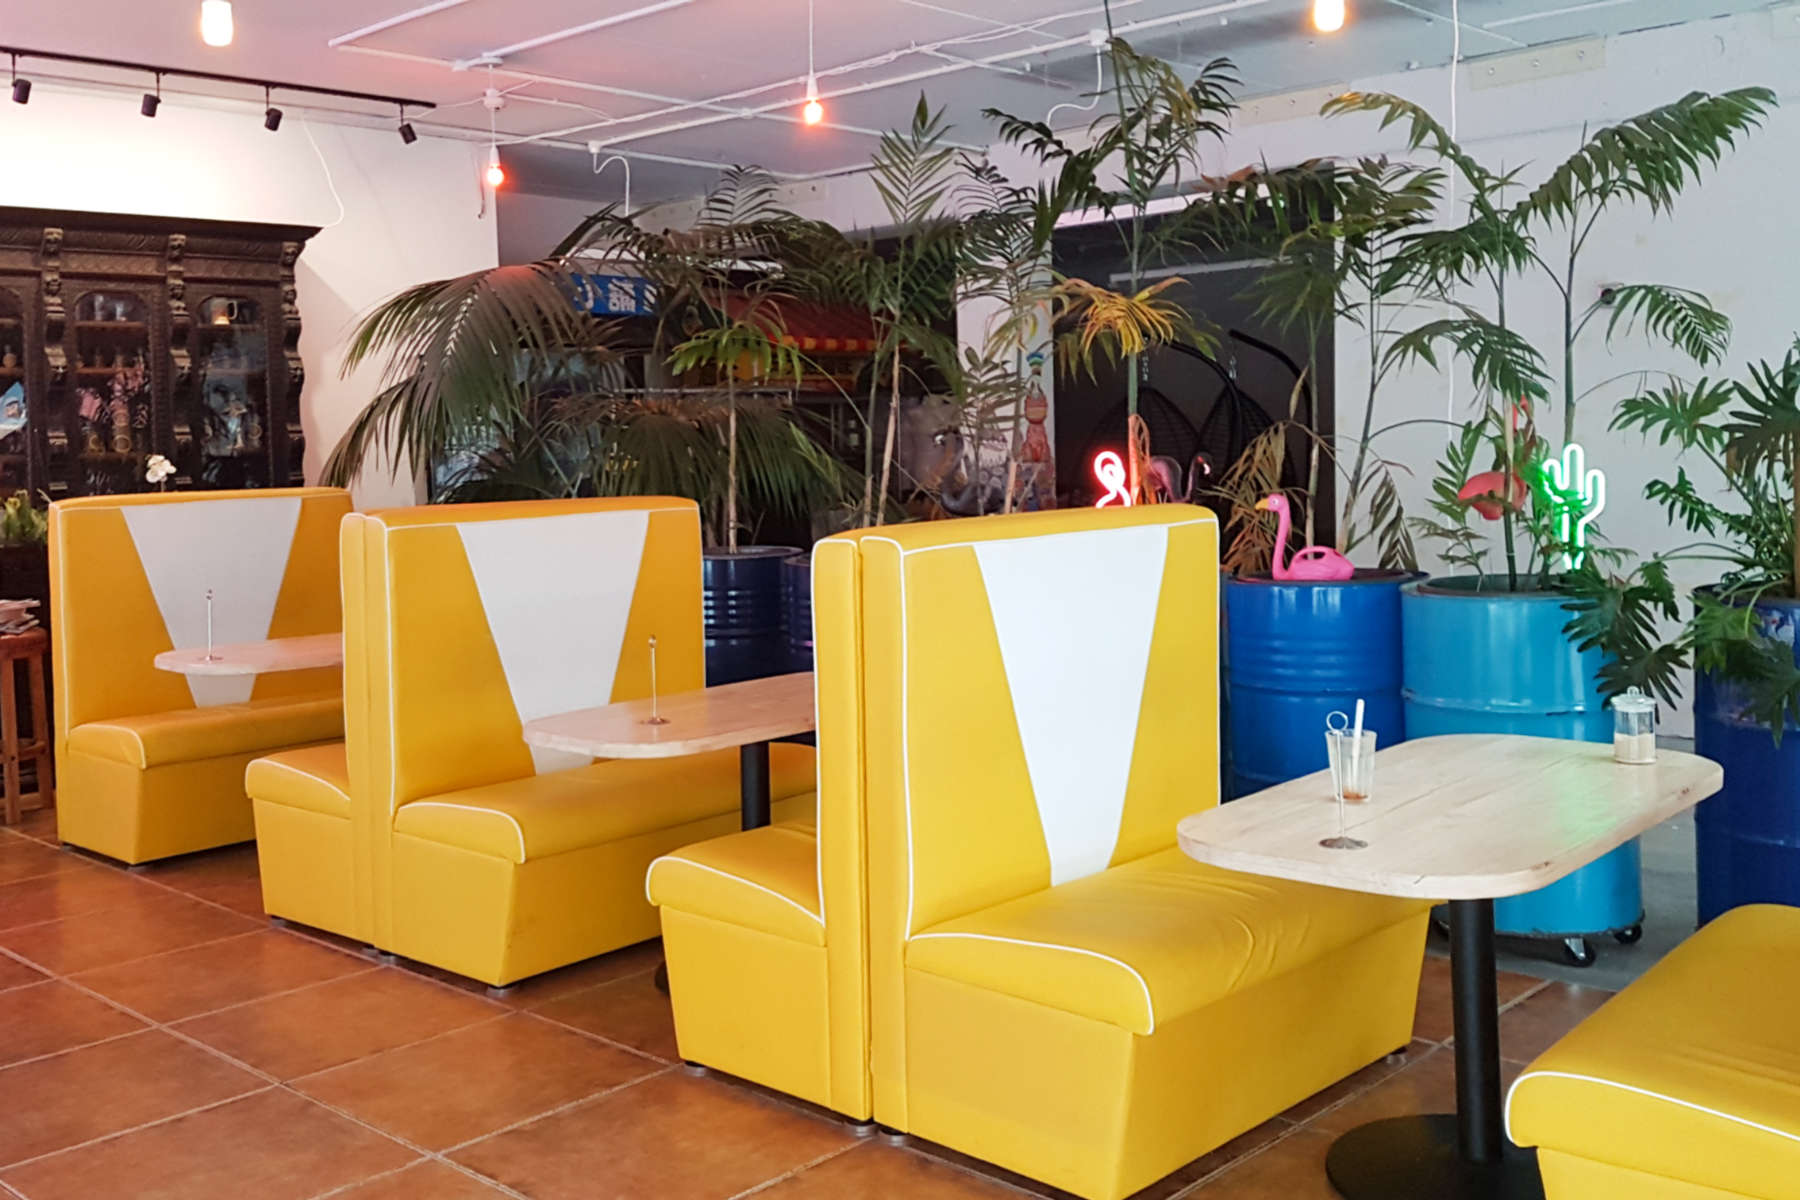 Gypsy Kitchen interior - yellow diner seating